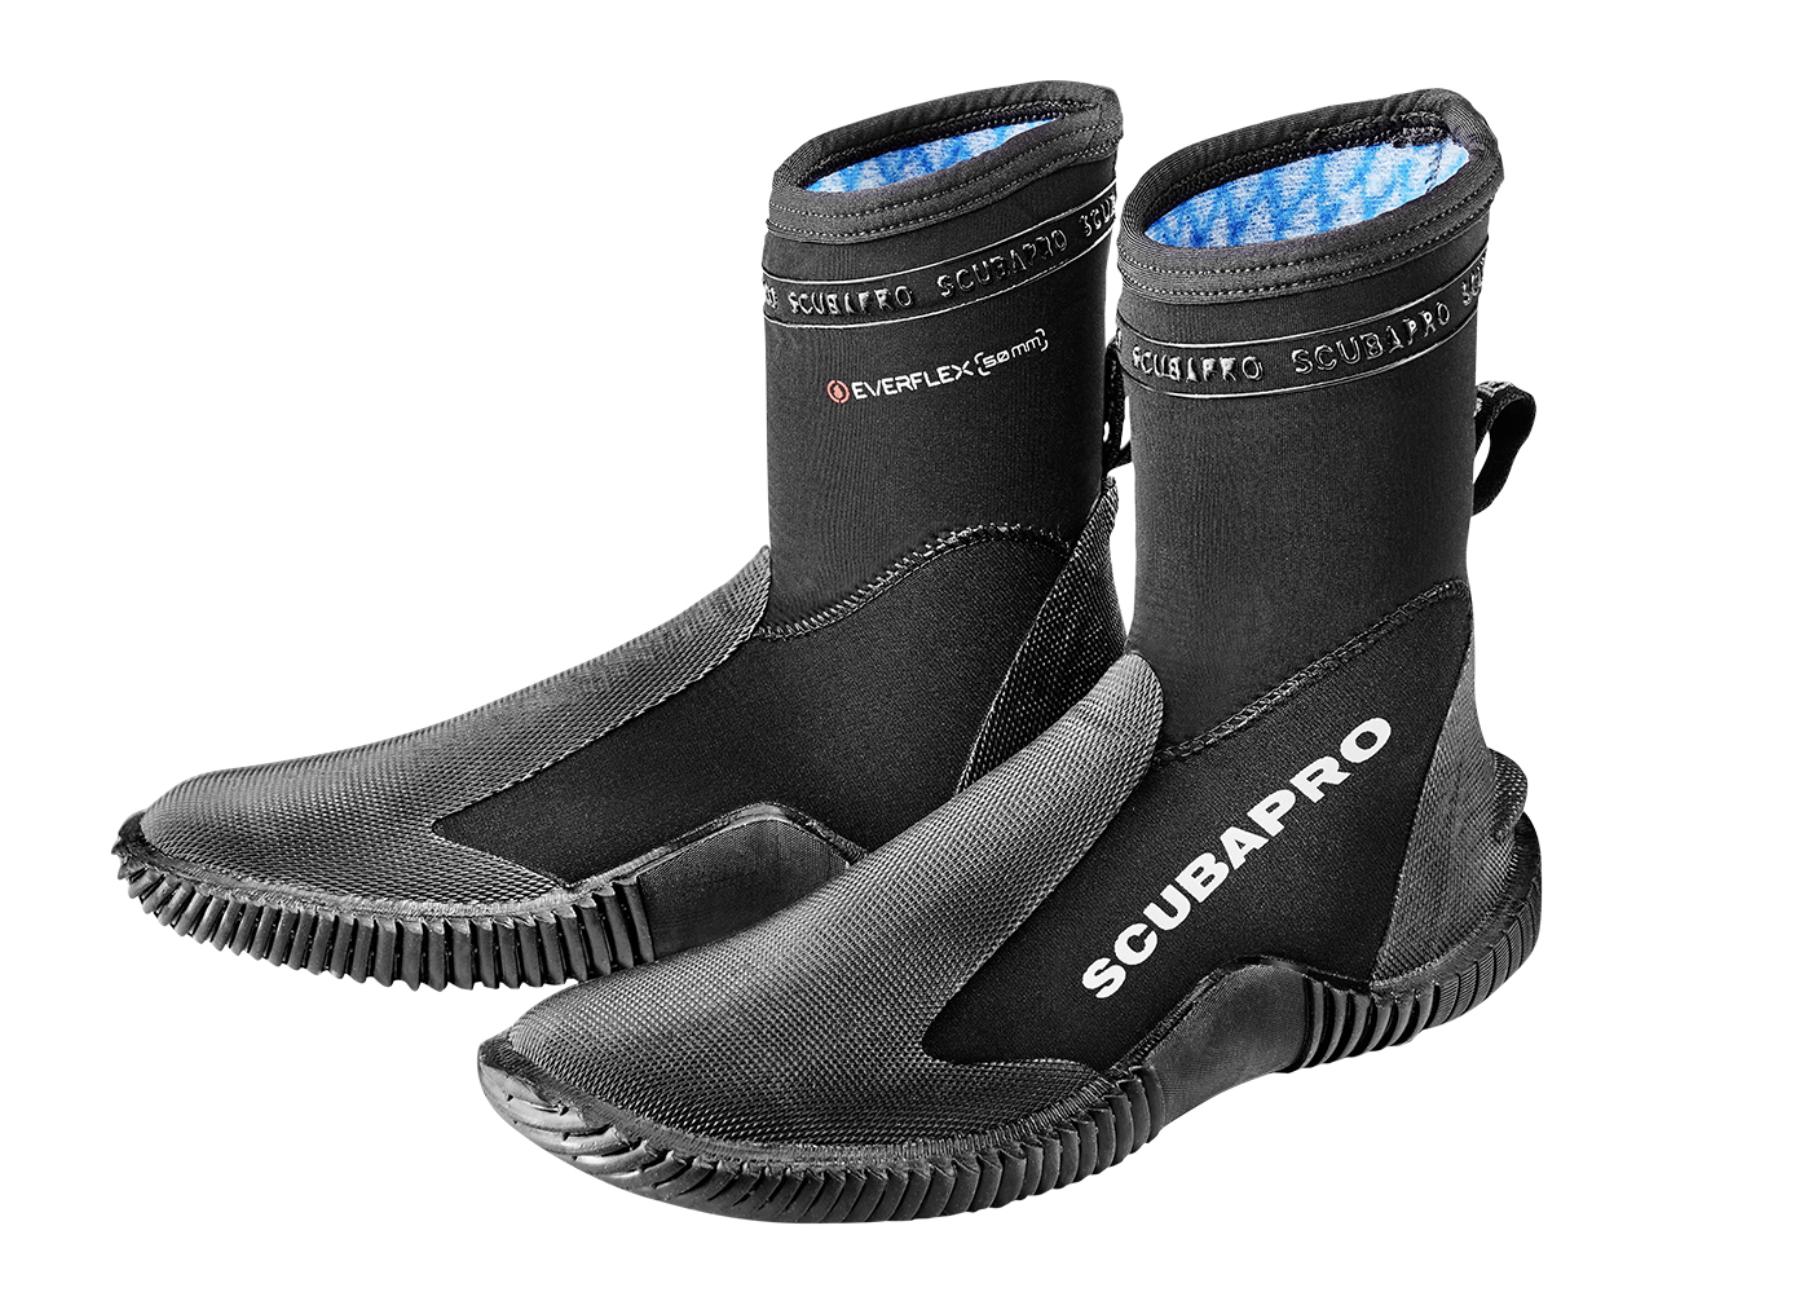 ScubaPro Everflex Boot 5MM